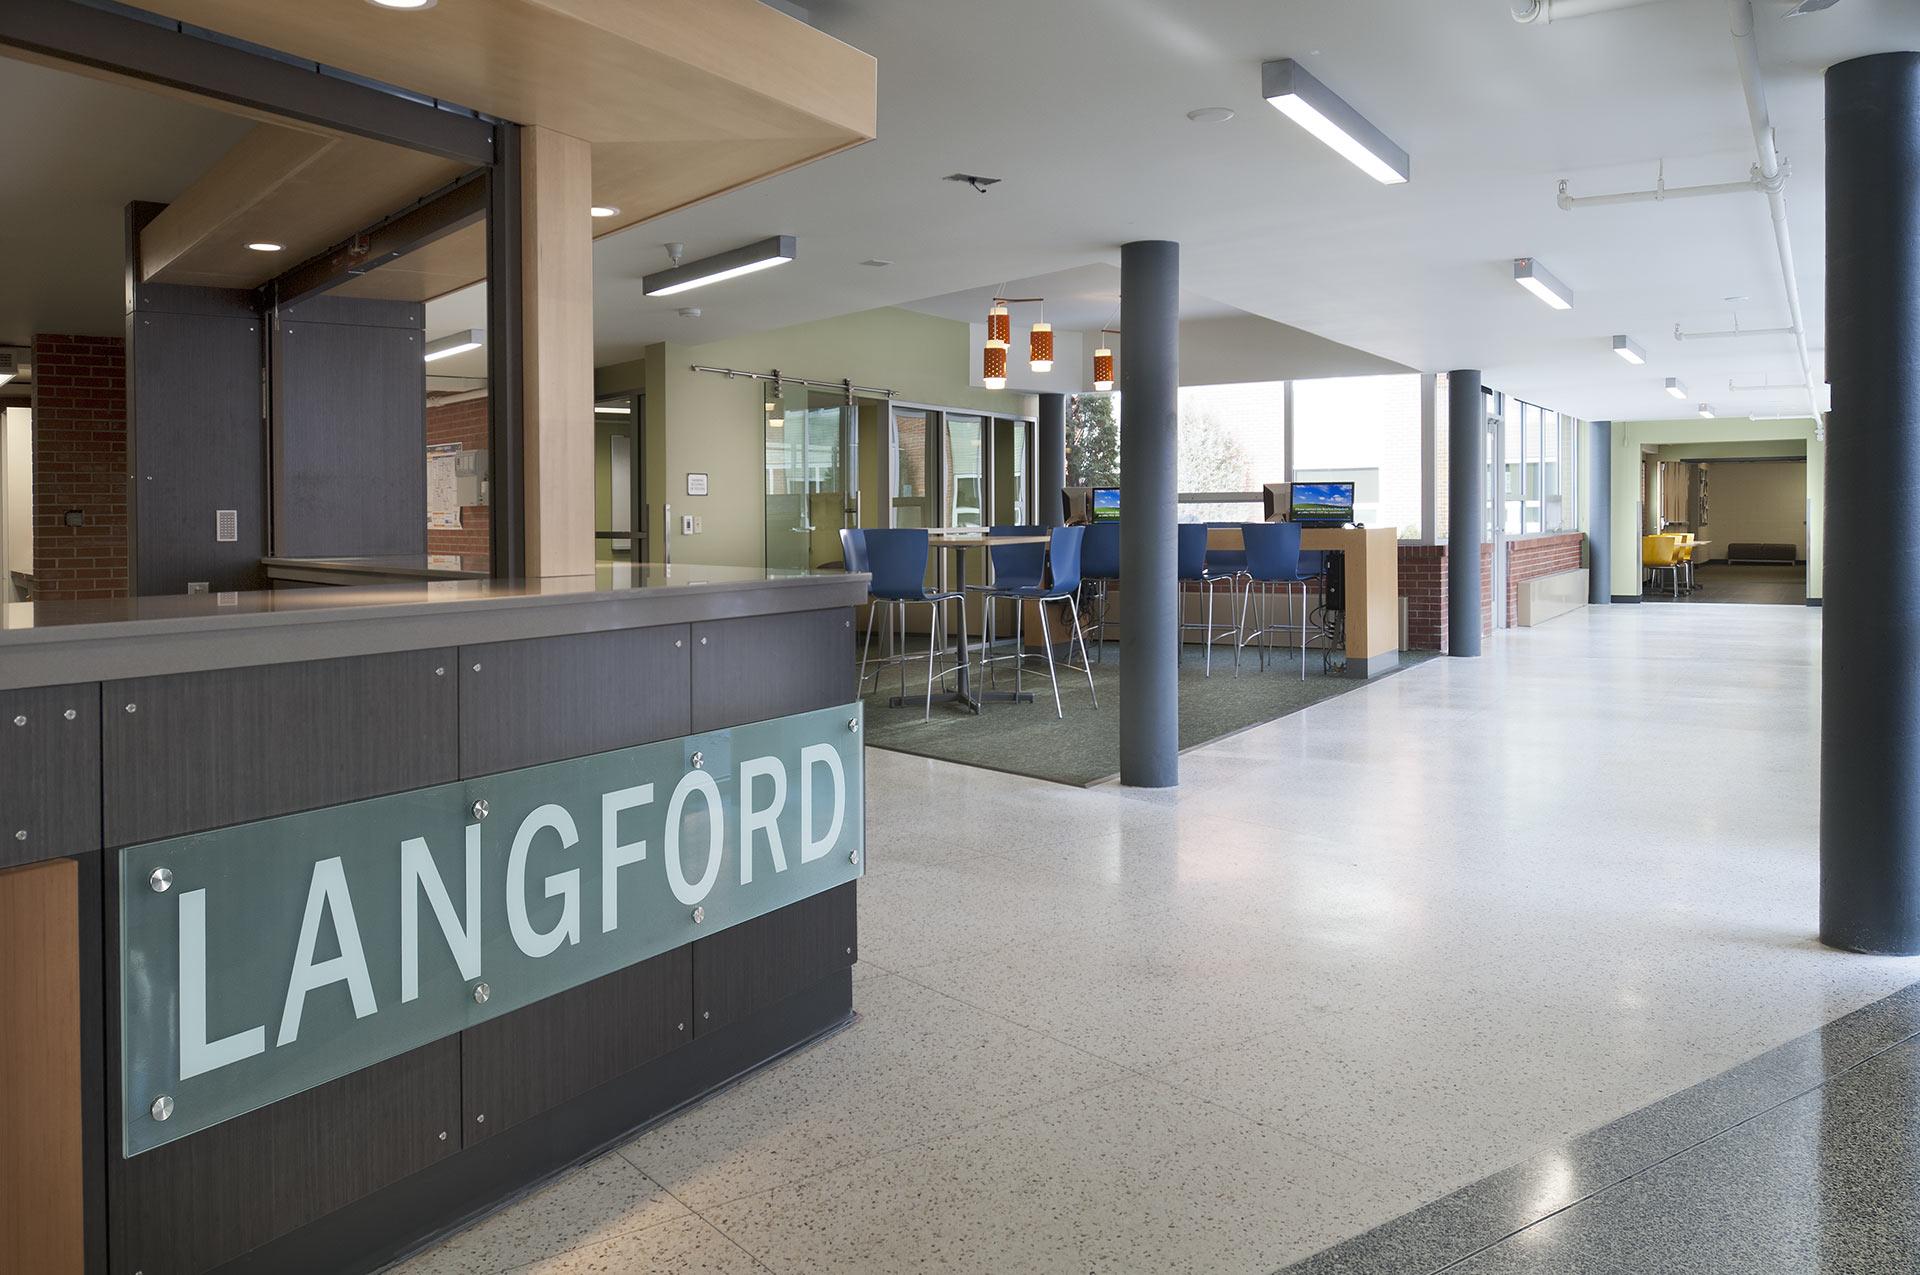 Langford-Hall-2.jpg